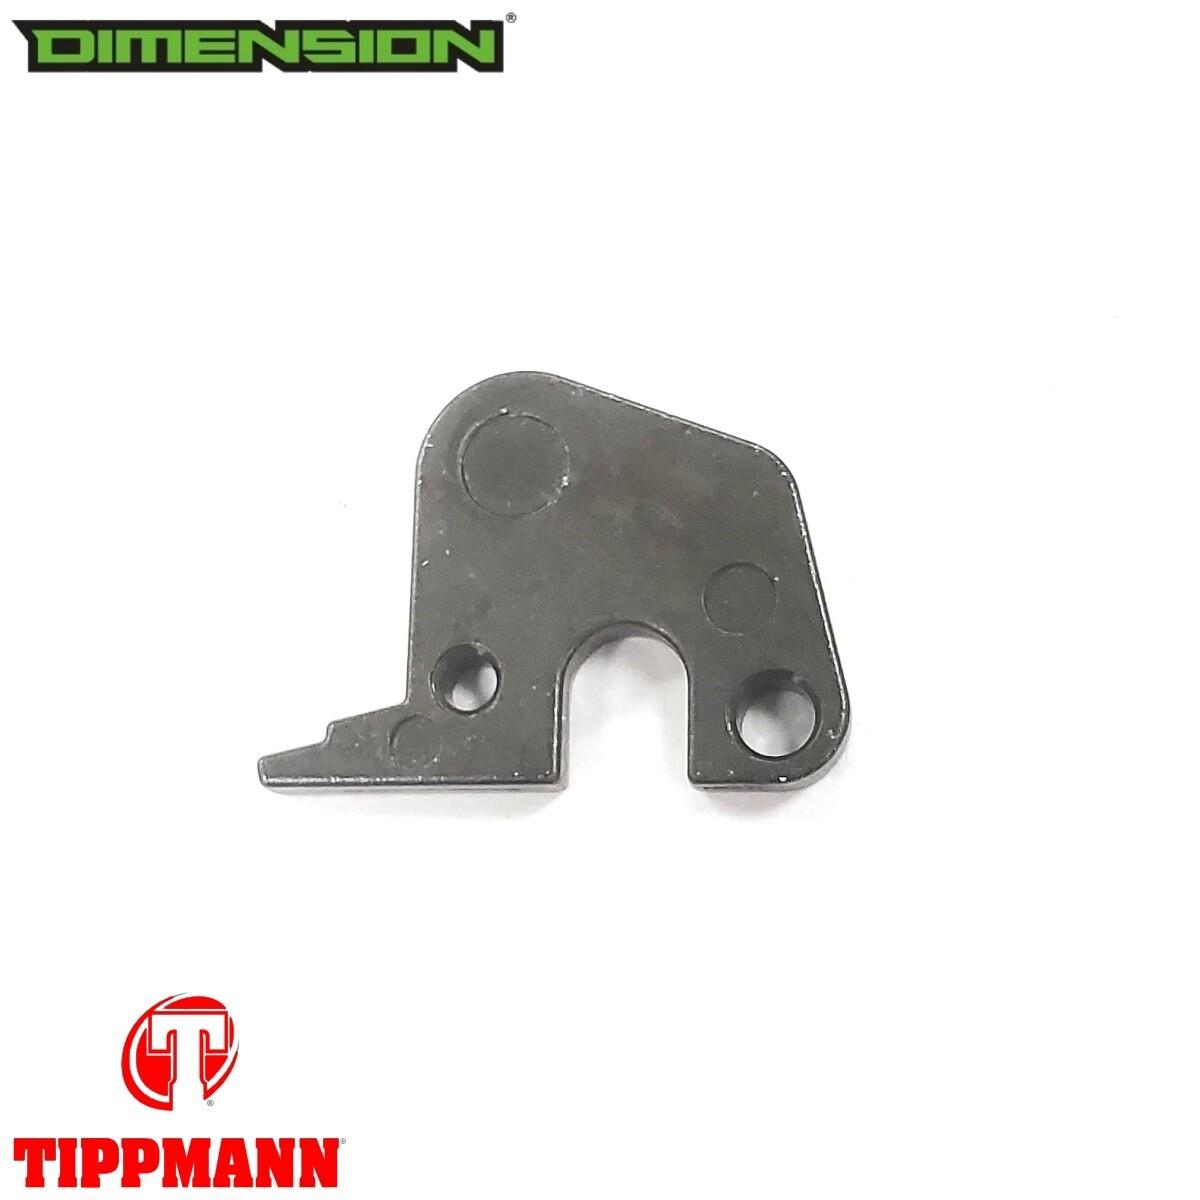 Tippmann 98 Custom - Front Sight